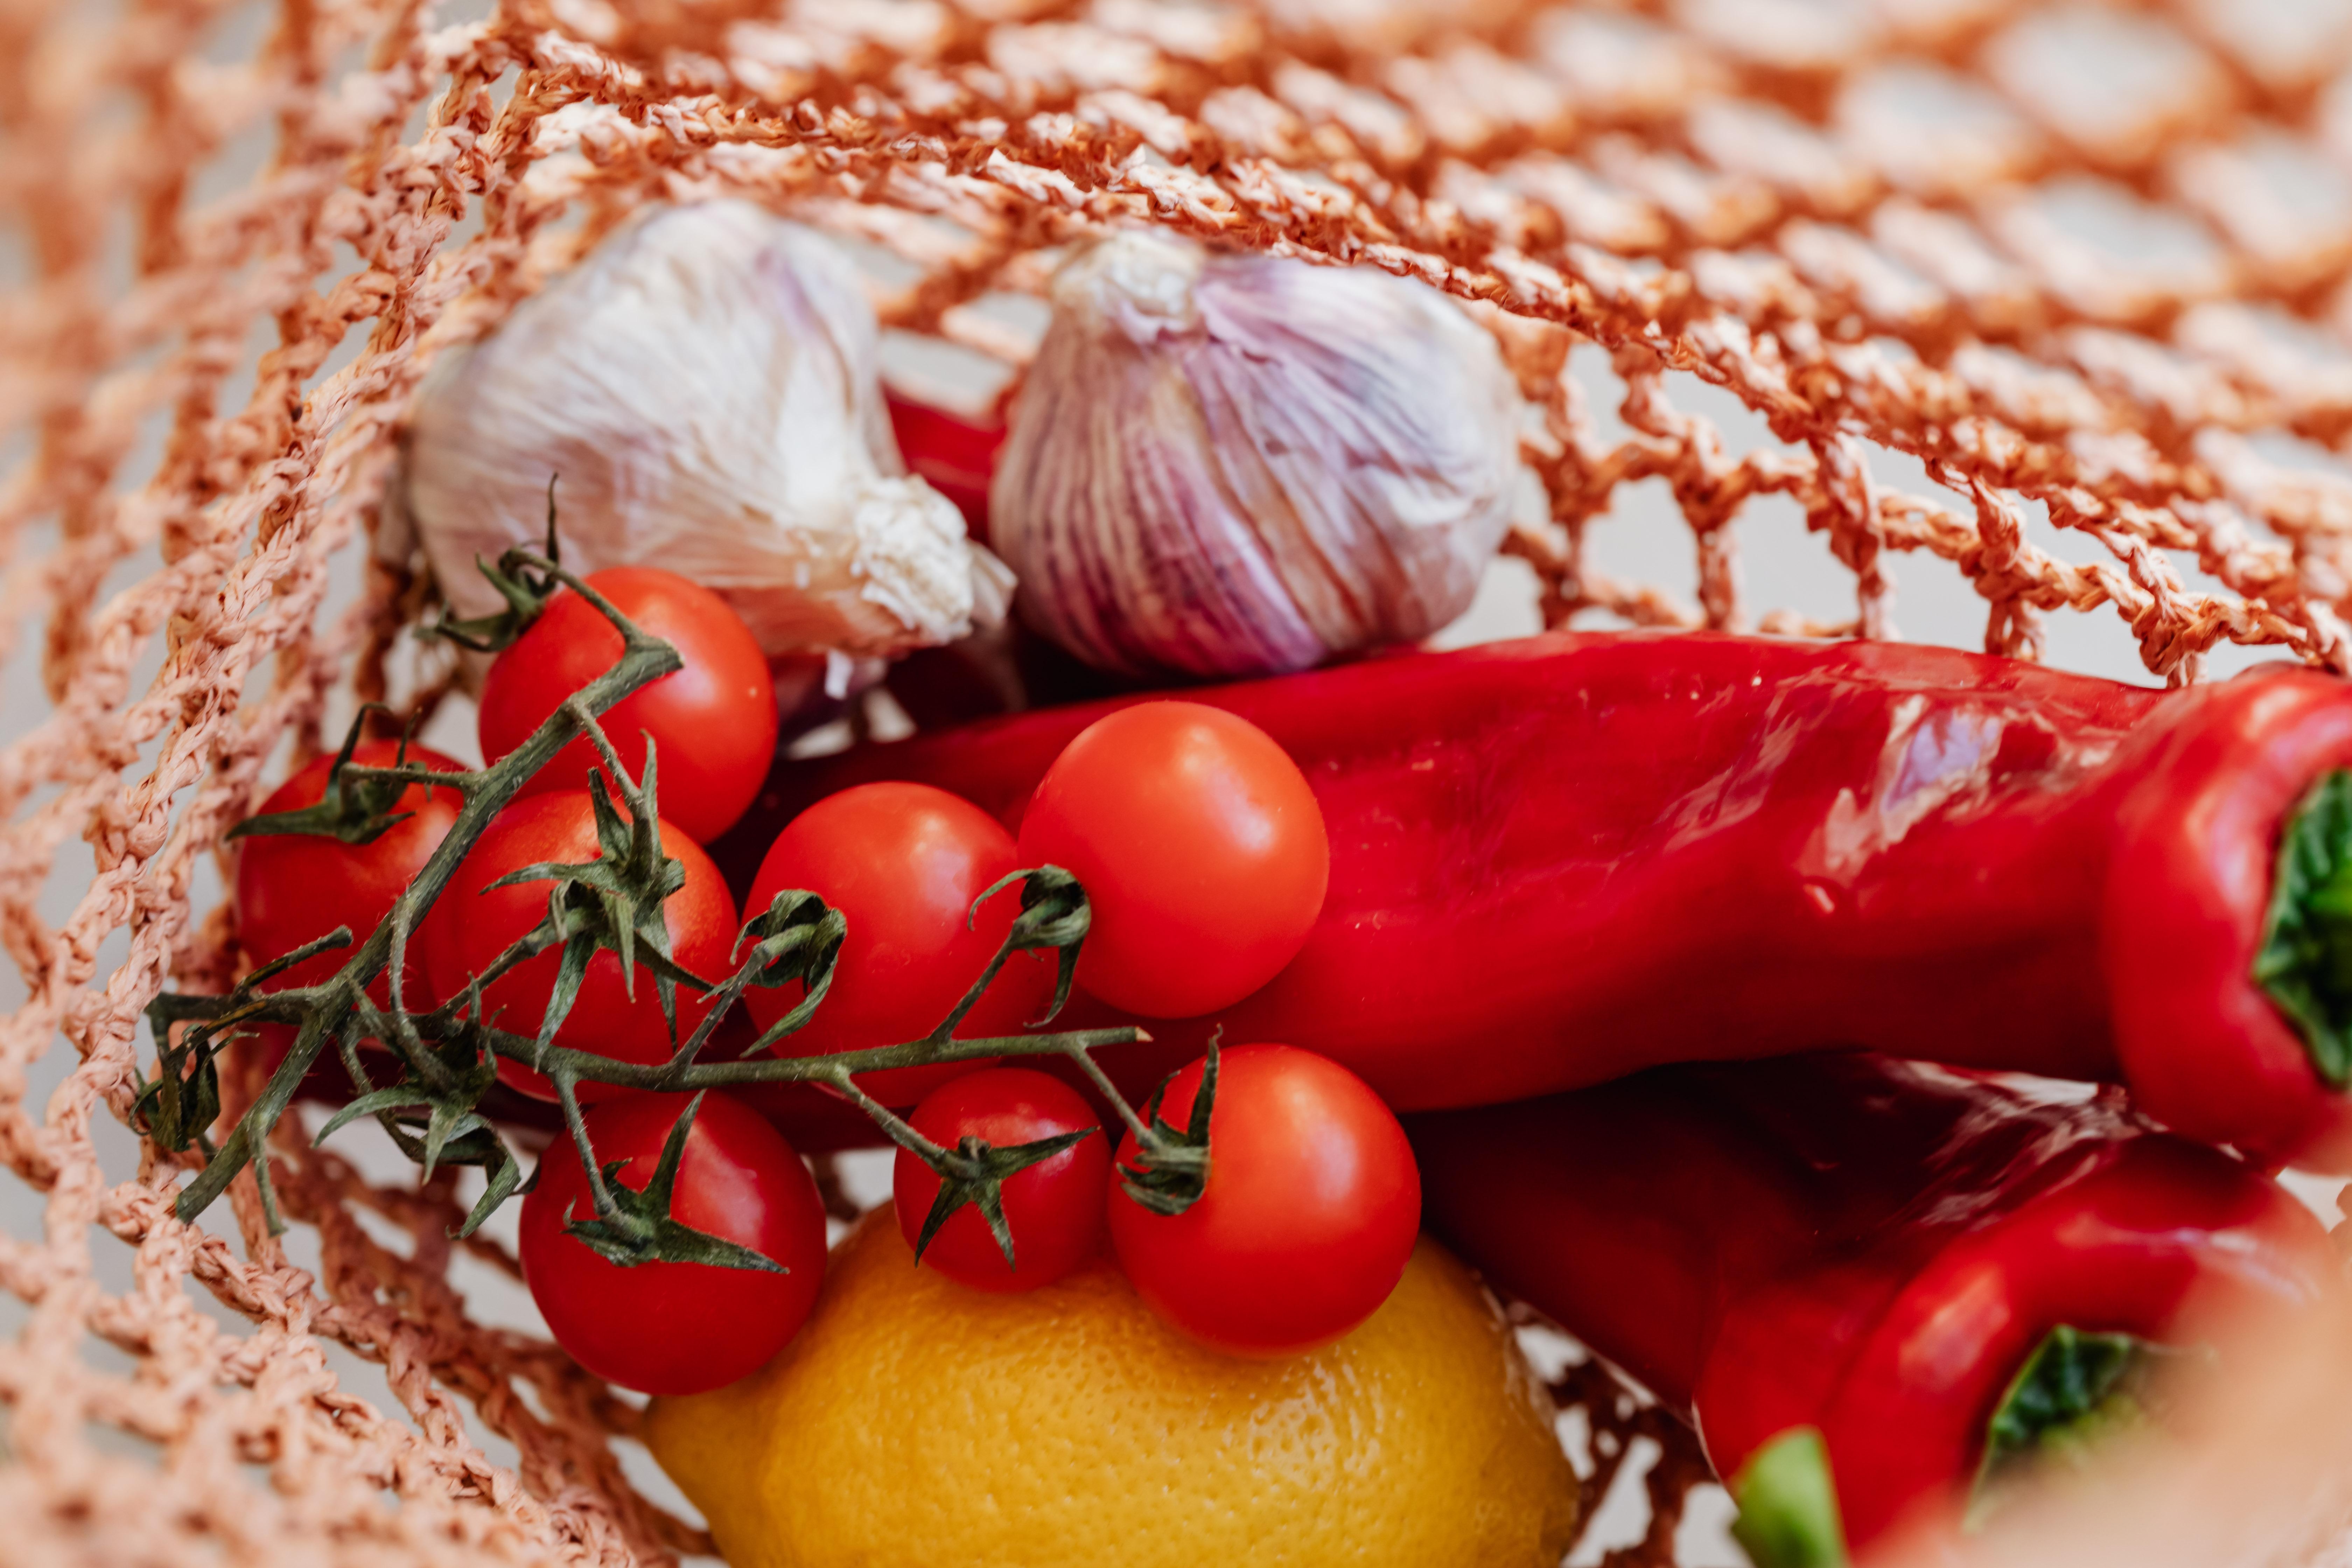 assortment of fresh vegetables with lemon in food net